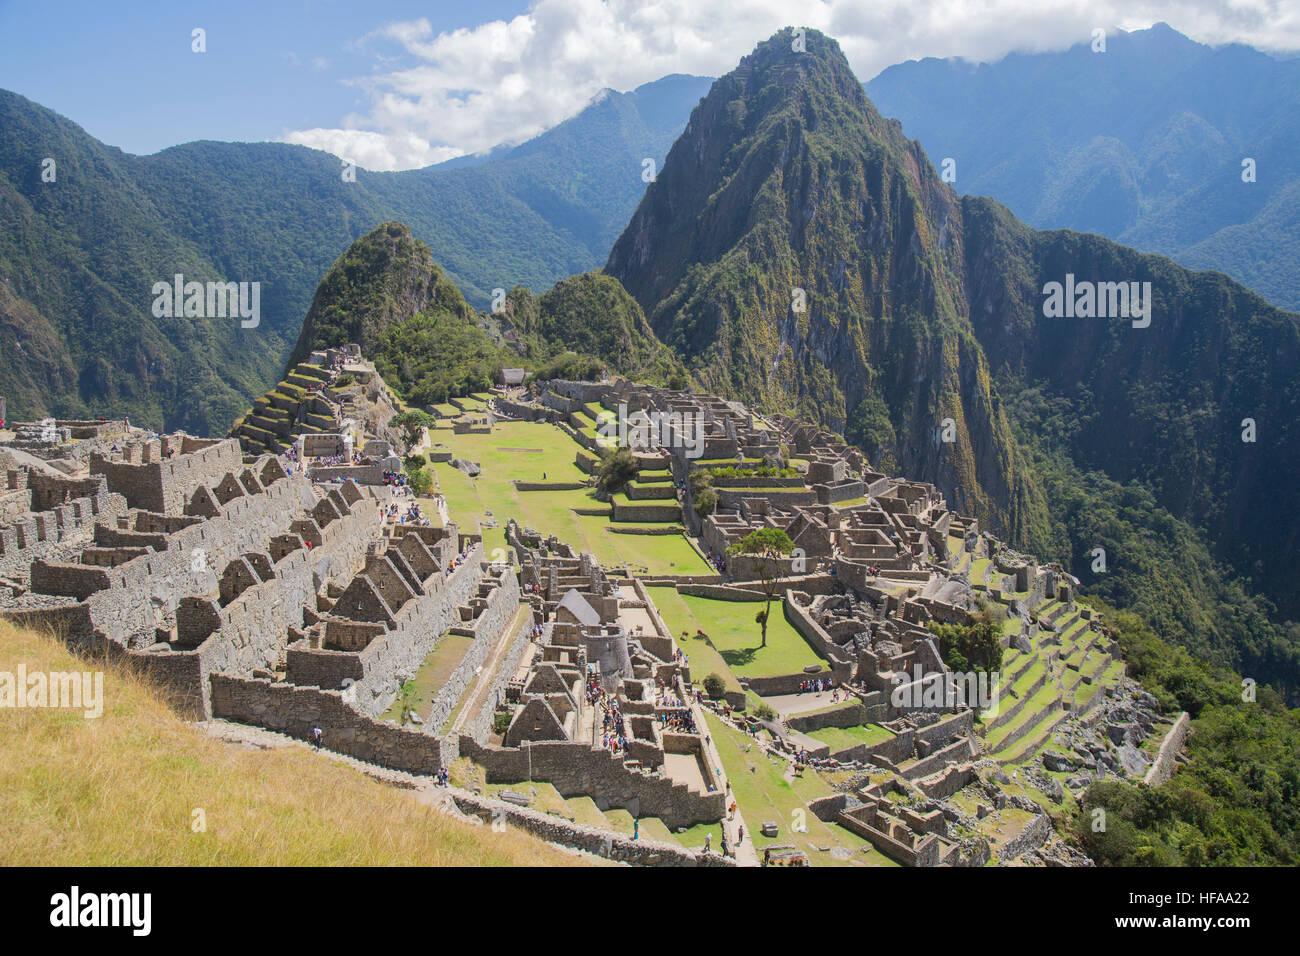 View of Machu Picchu - Stock Image